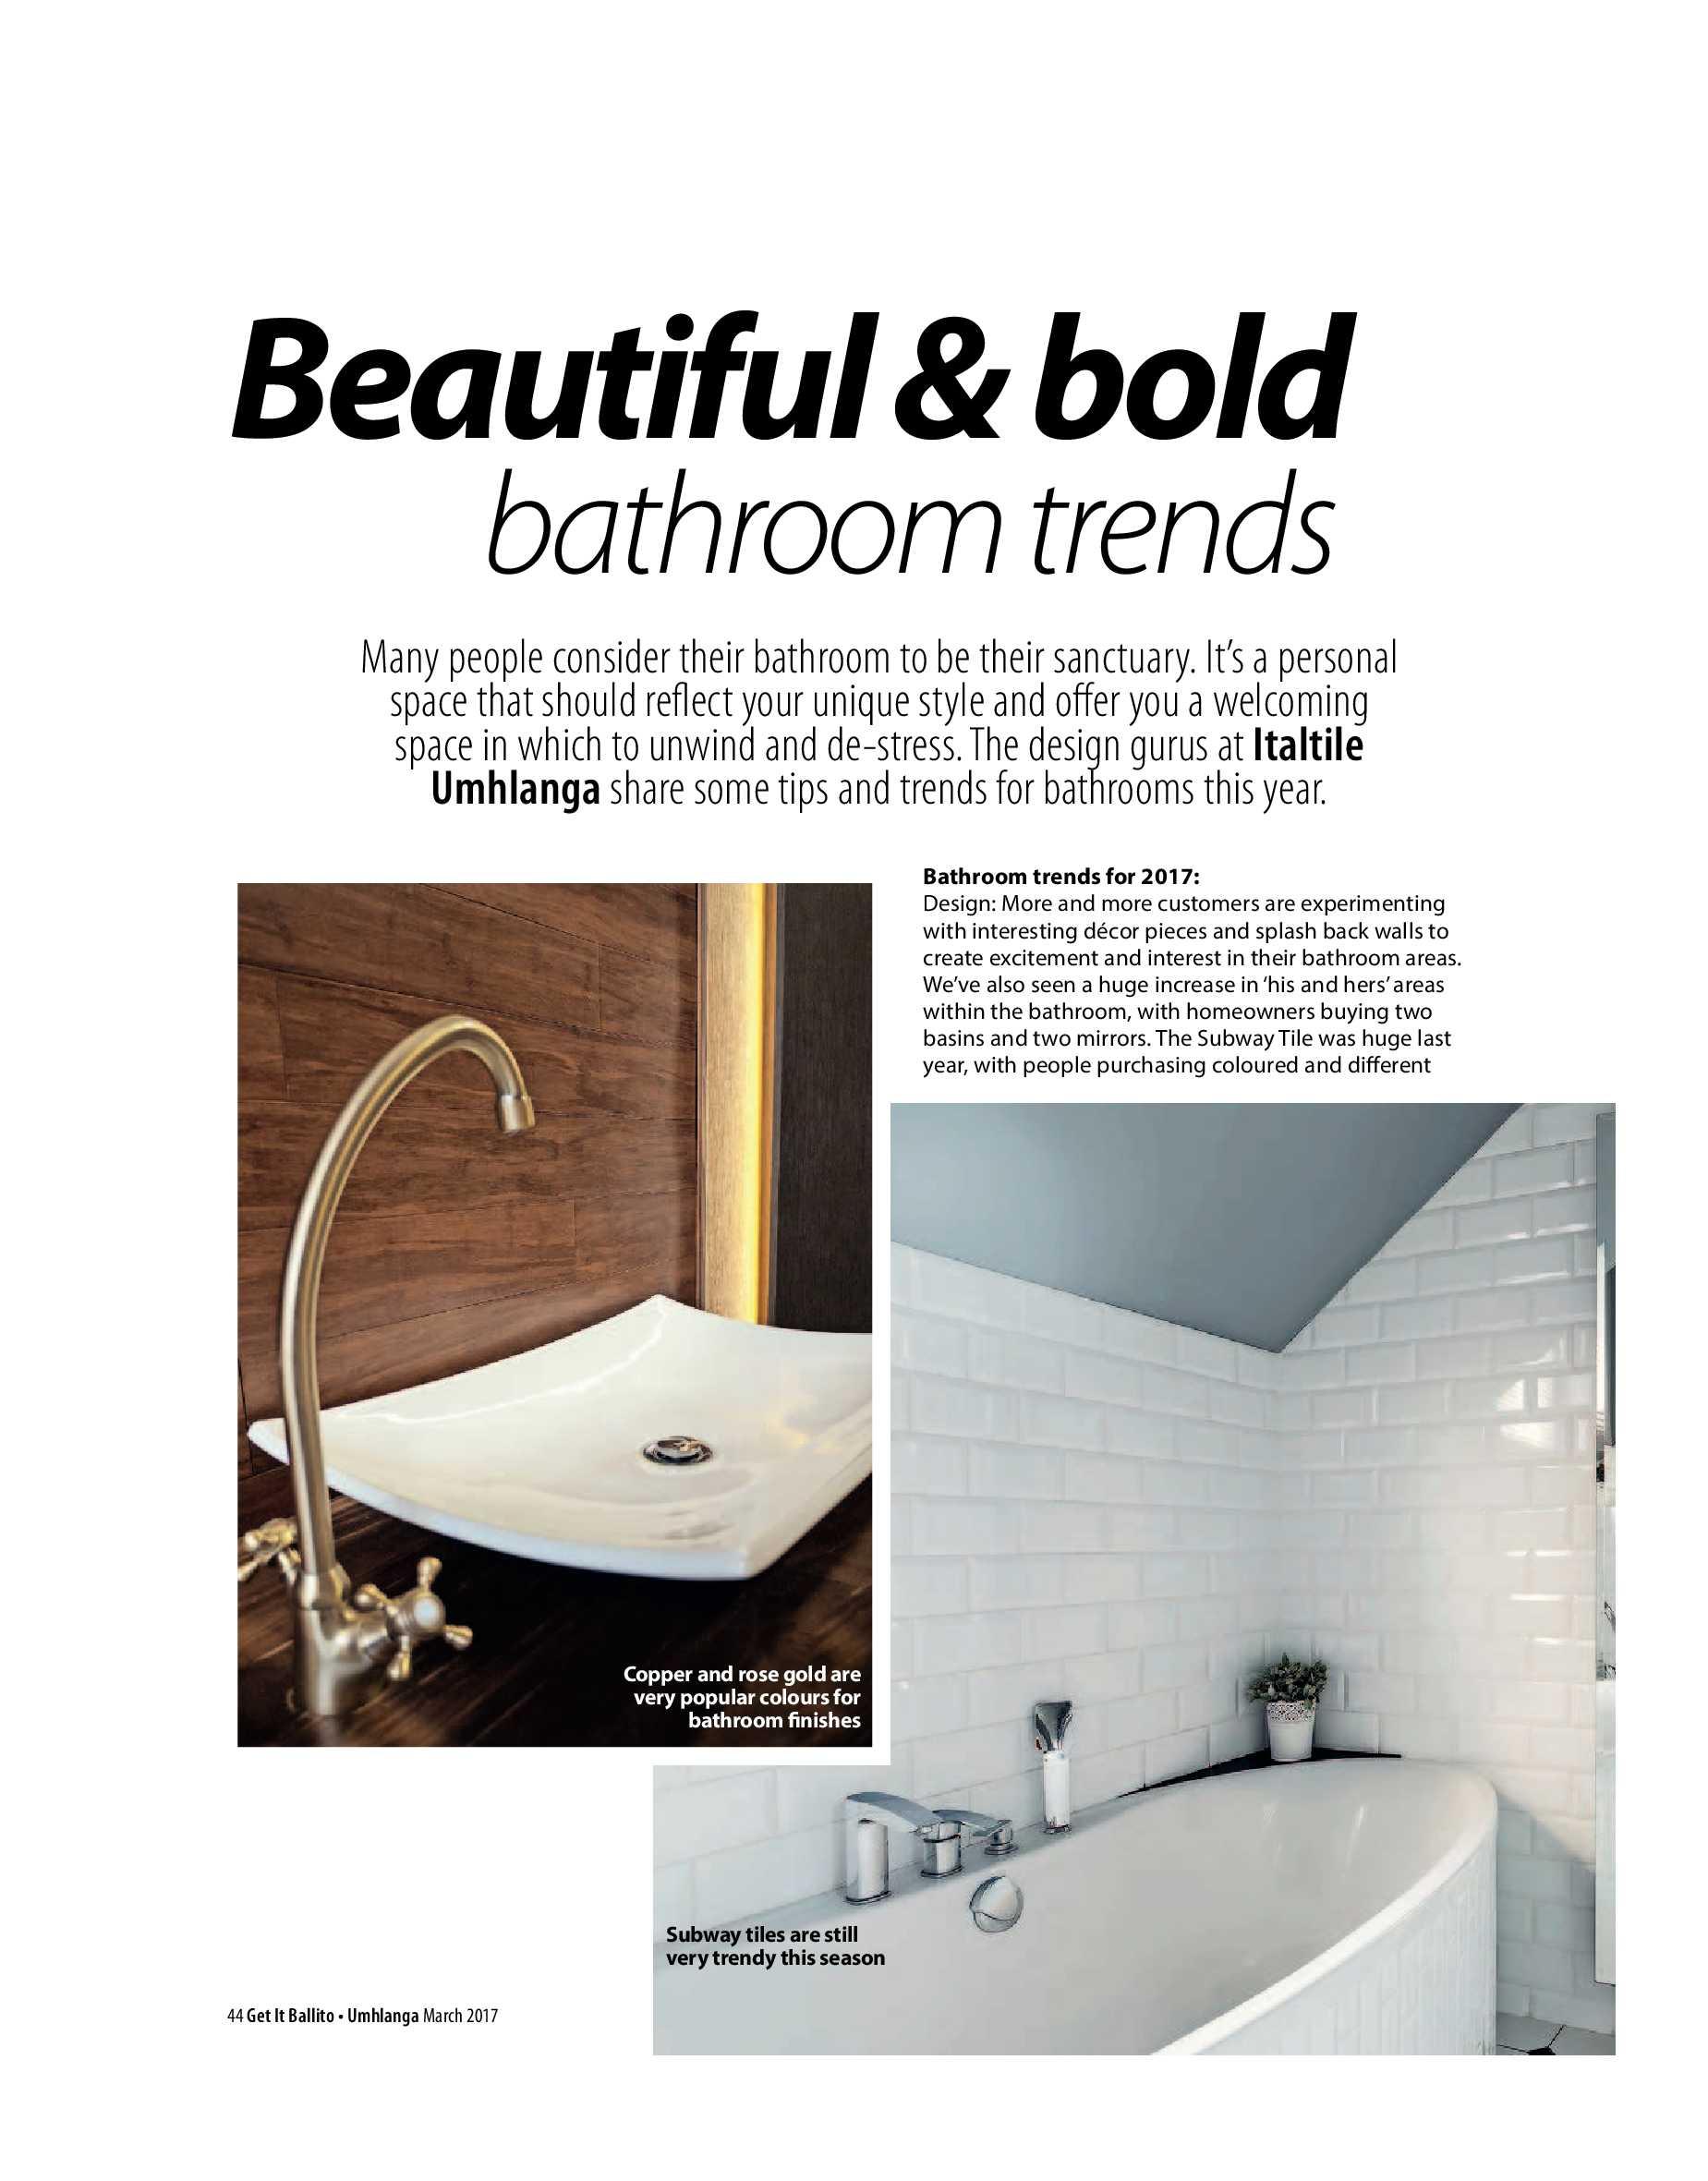 get-magazine-ballitoumhlanga-march-2017-epapers-page-46